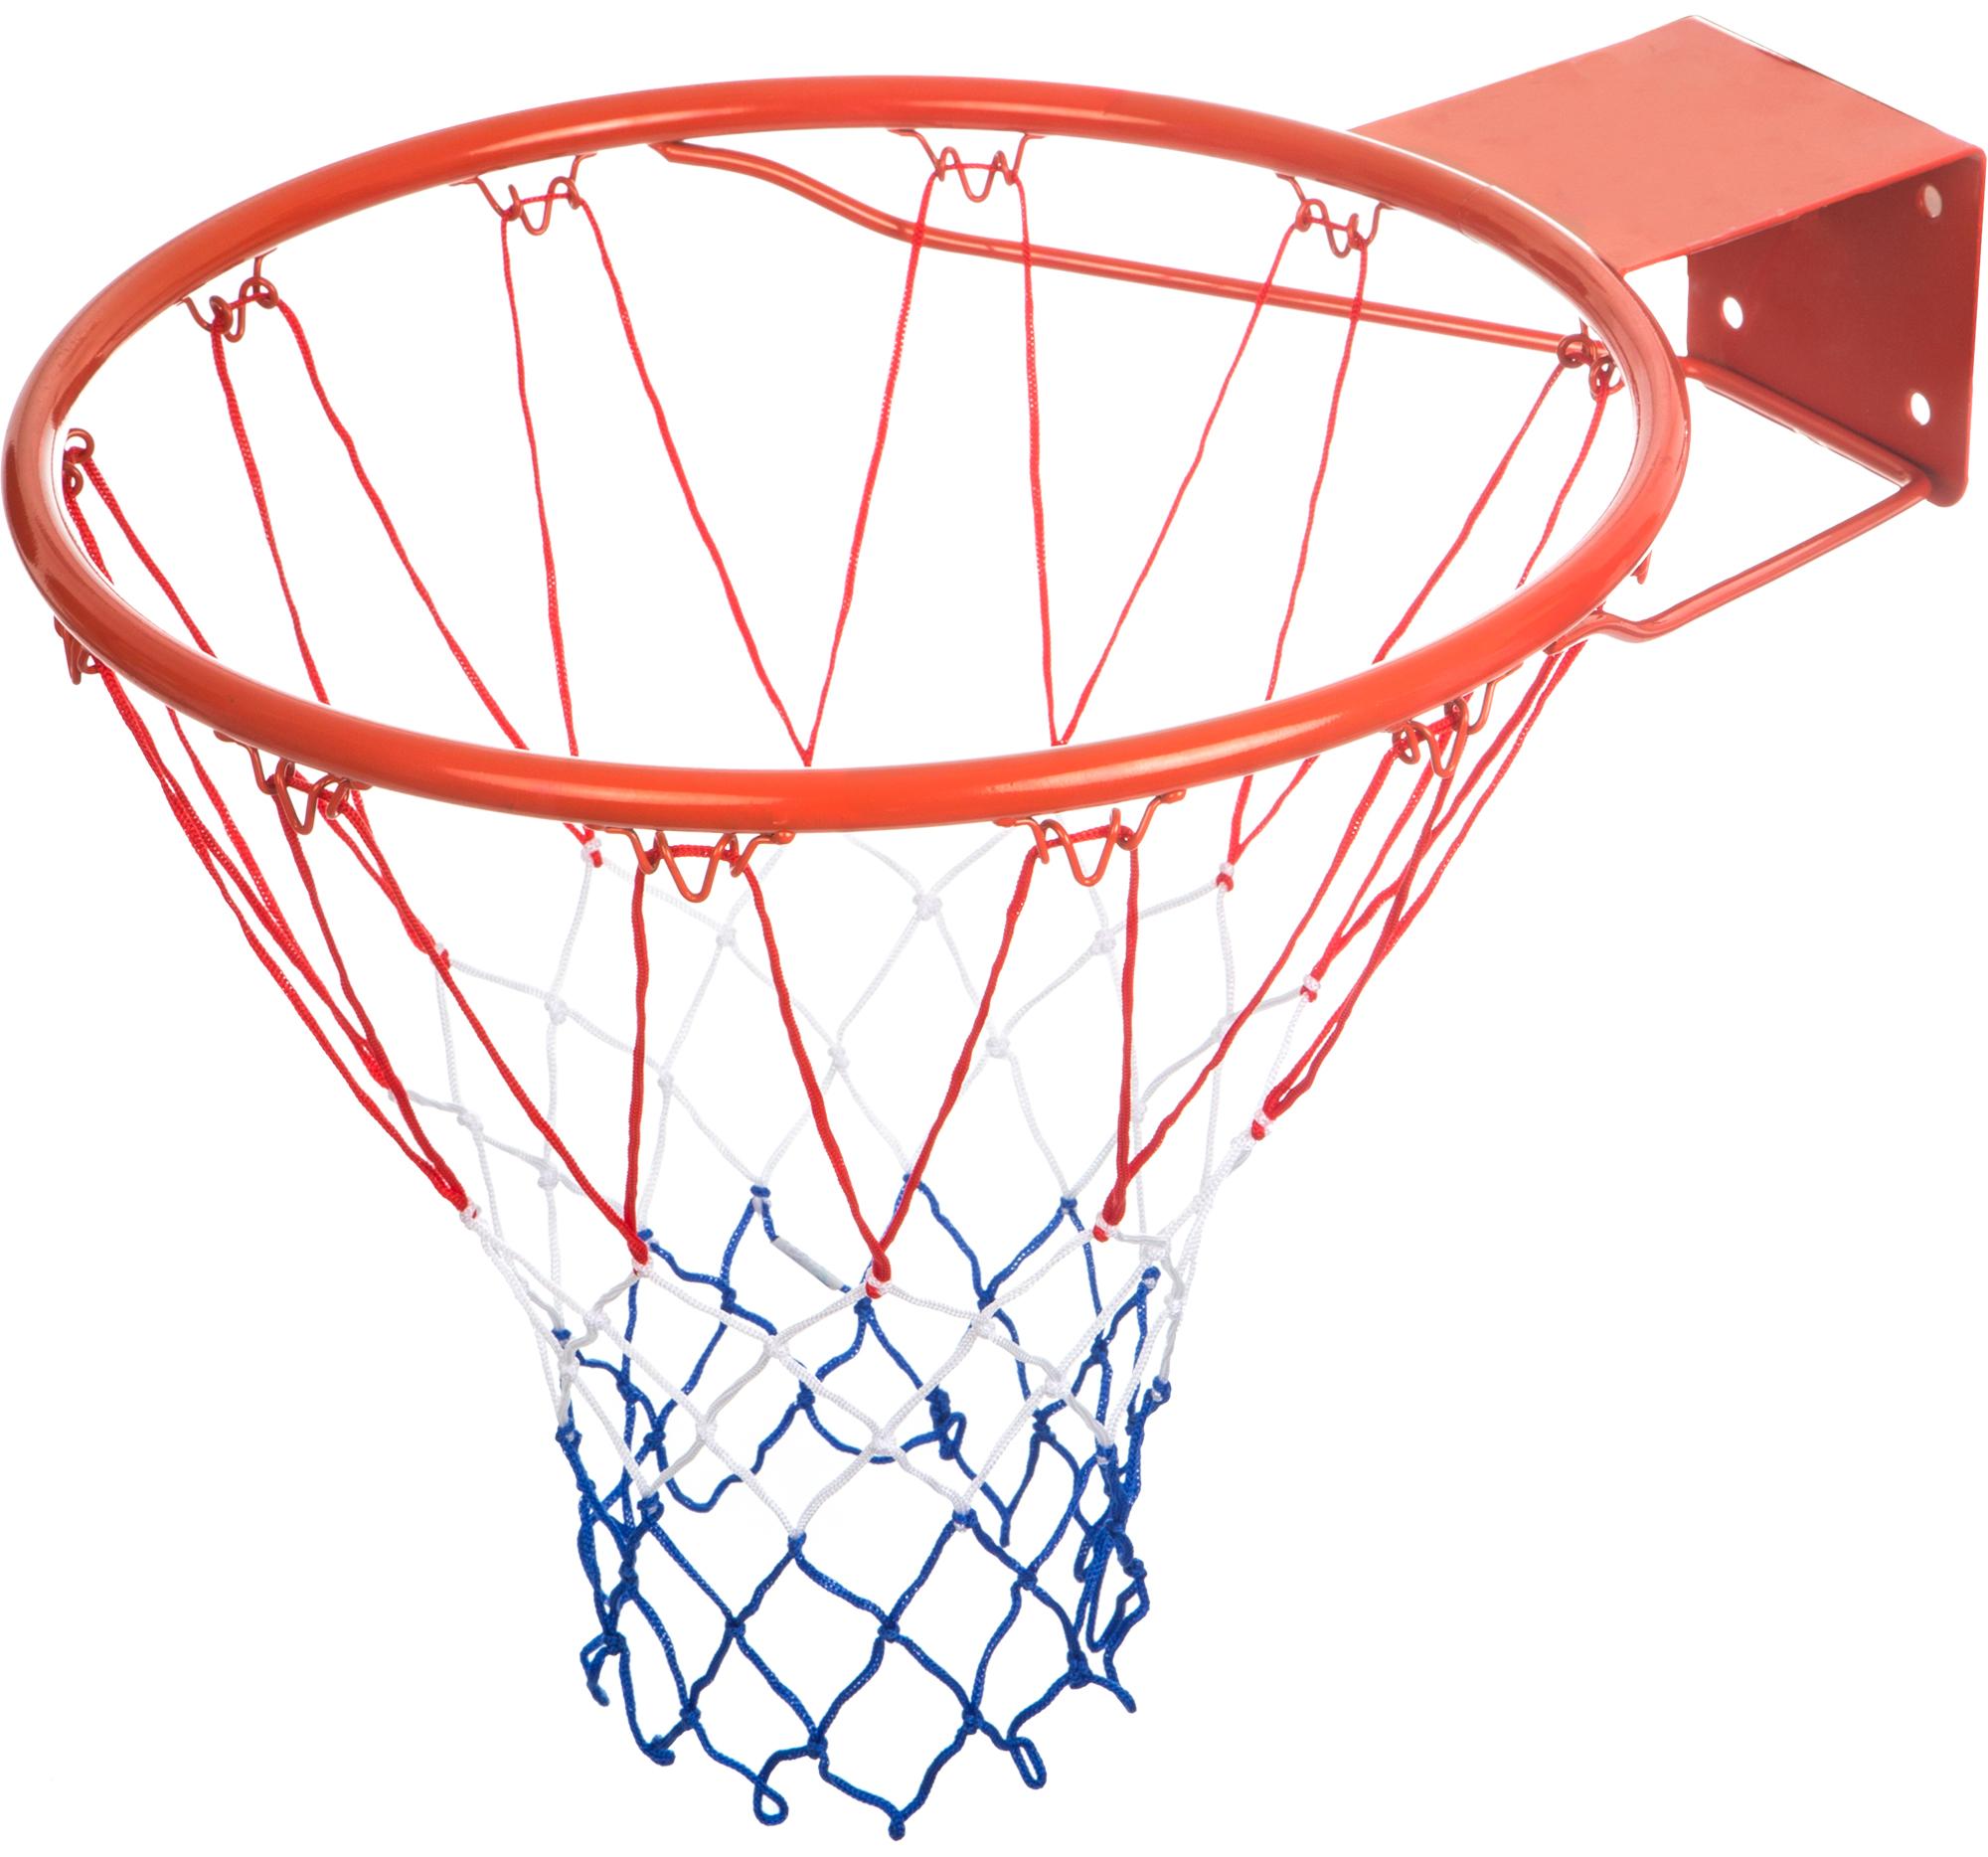 Demix Кольцо баскетбольное Demix игрушка zume games баскетбольное кольцо мини 52 003 00 0